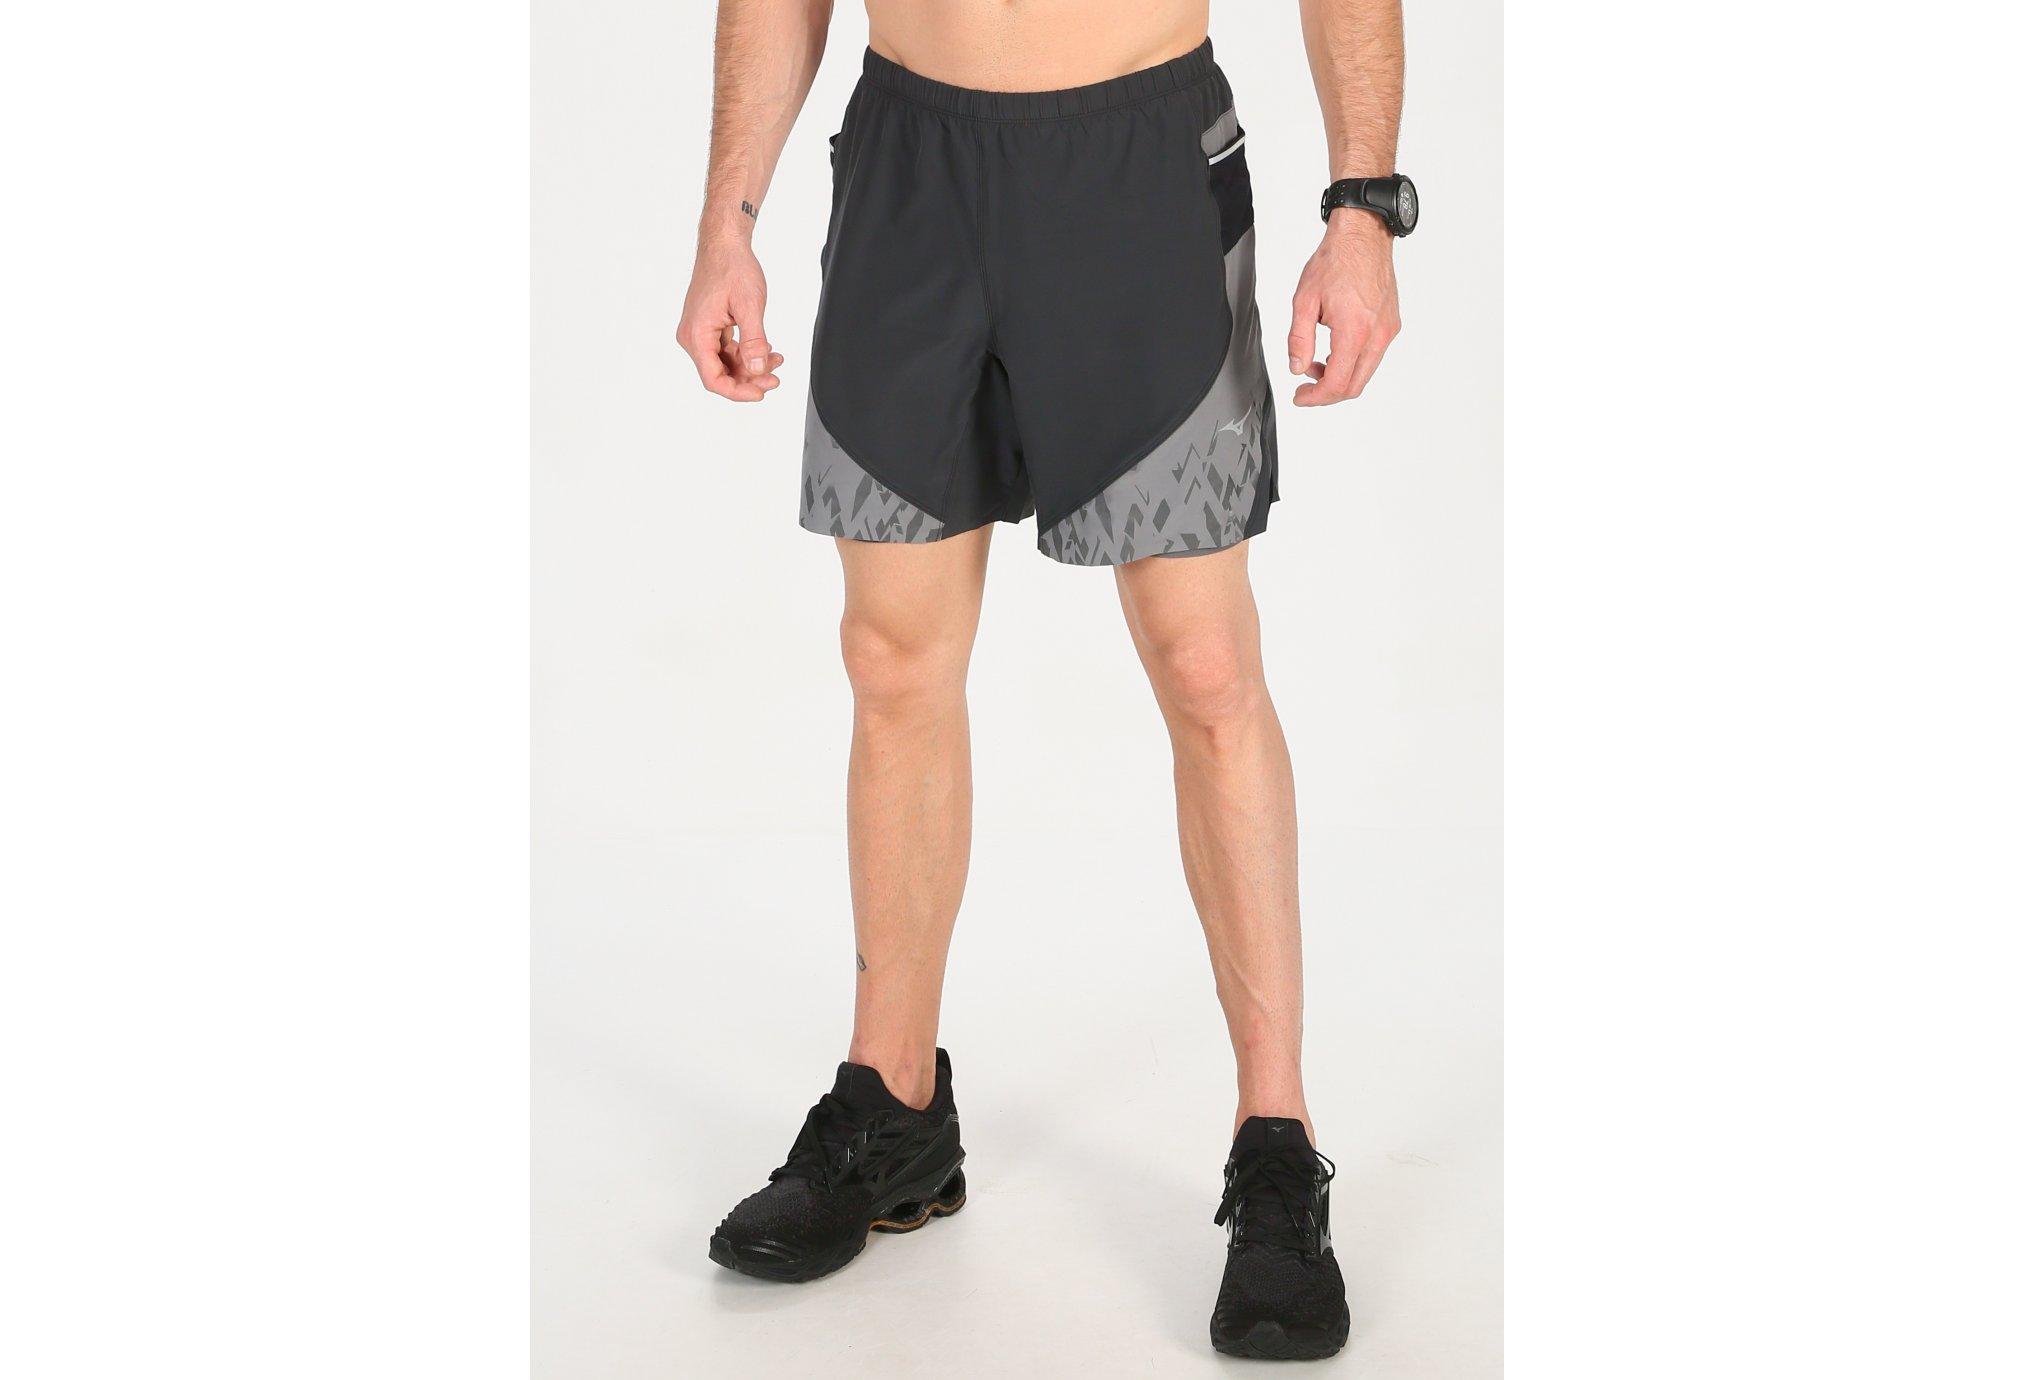 Mizuno Endura 7.5 2 en 1 M vêtement running homme